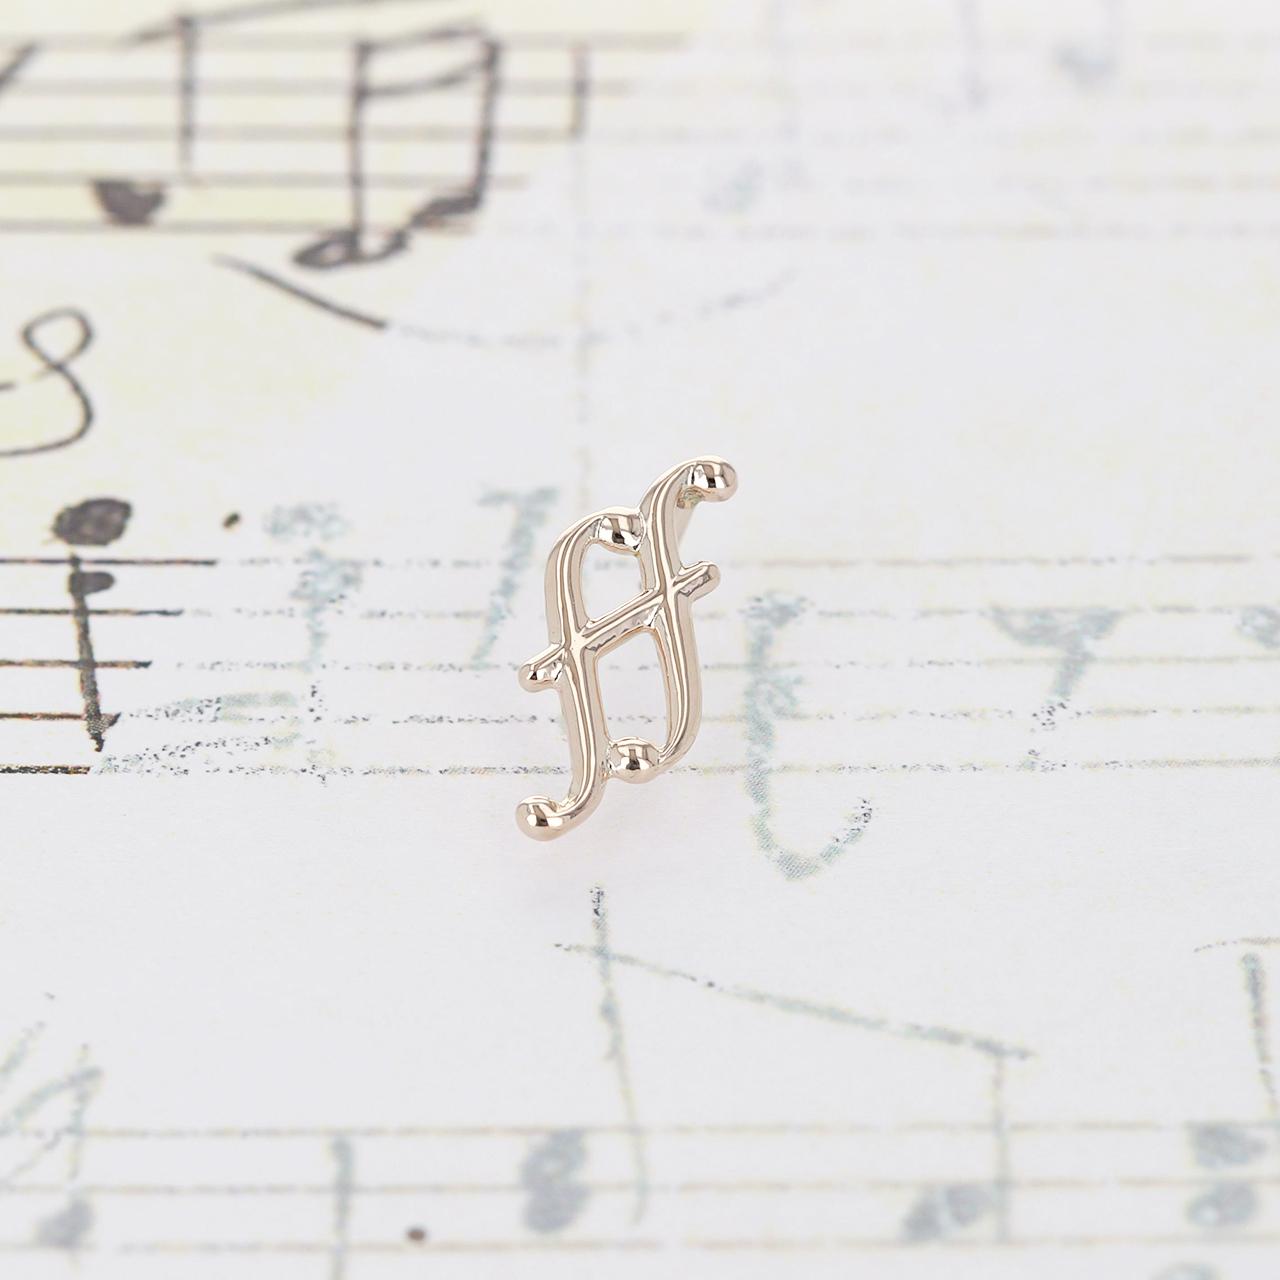 K10 / ピアス (片耳) / フォルティシモスタッドピアス